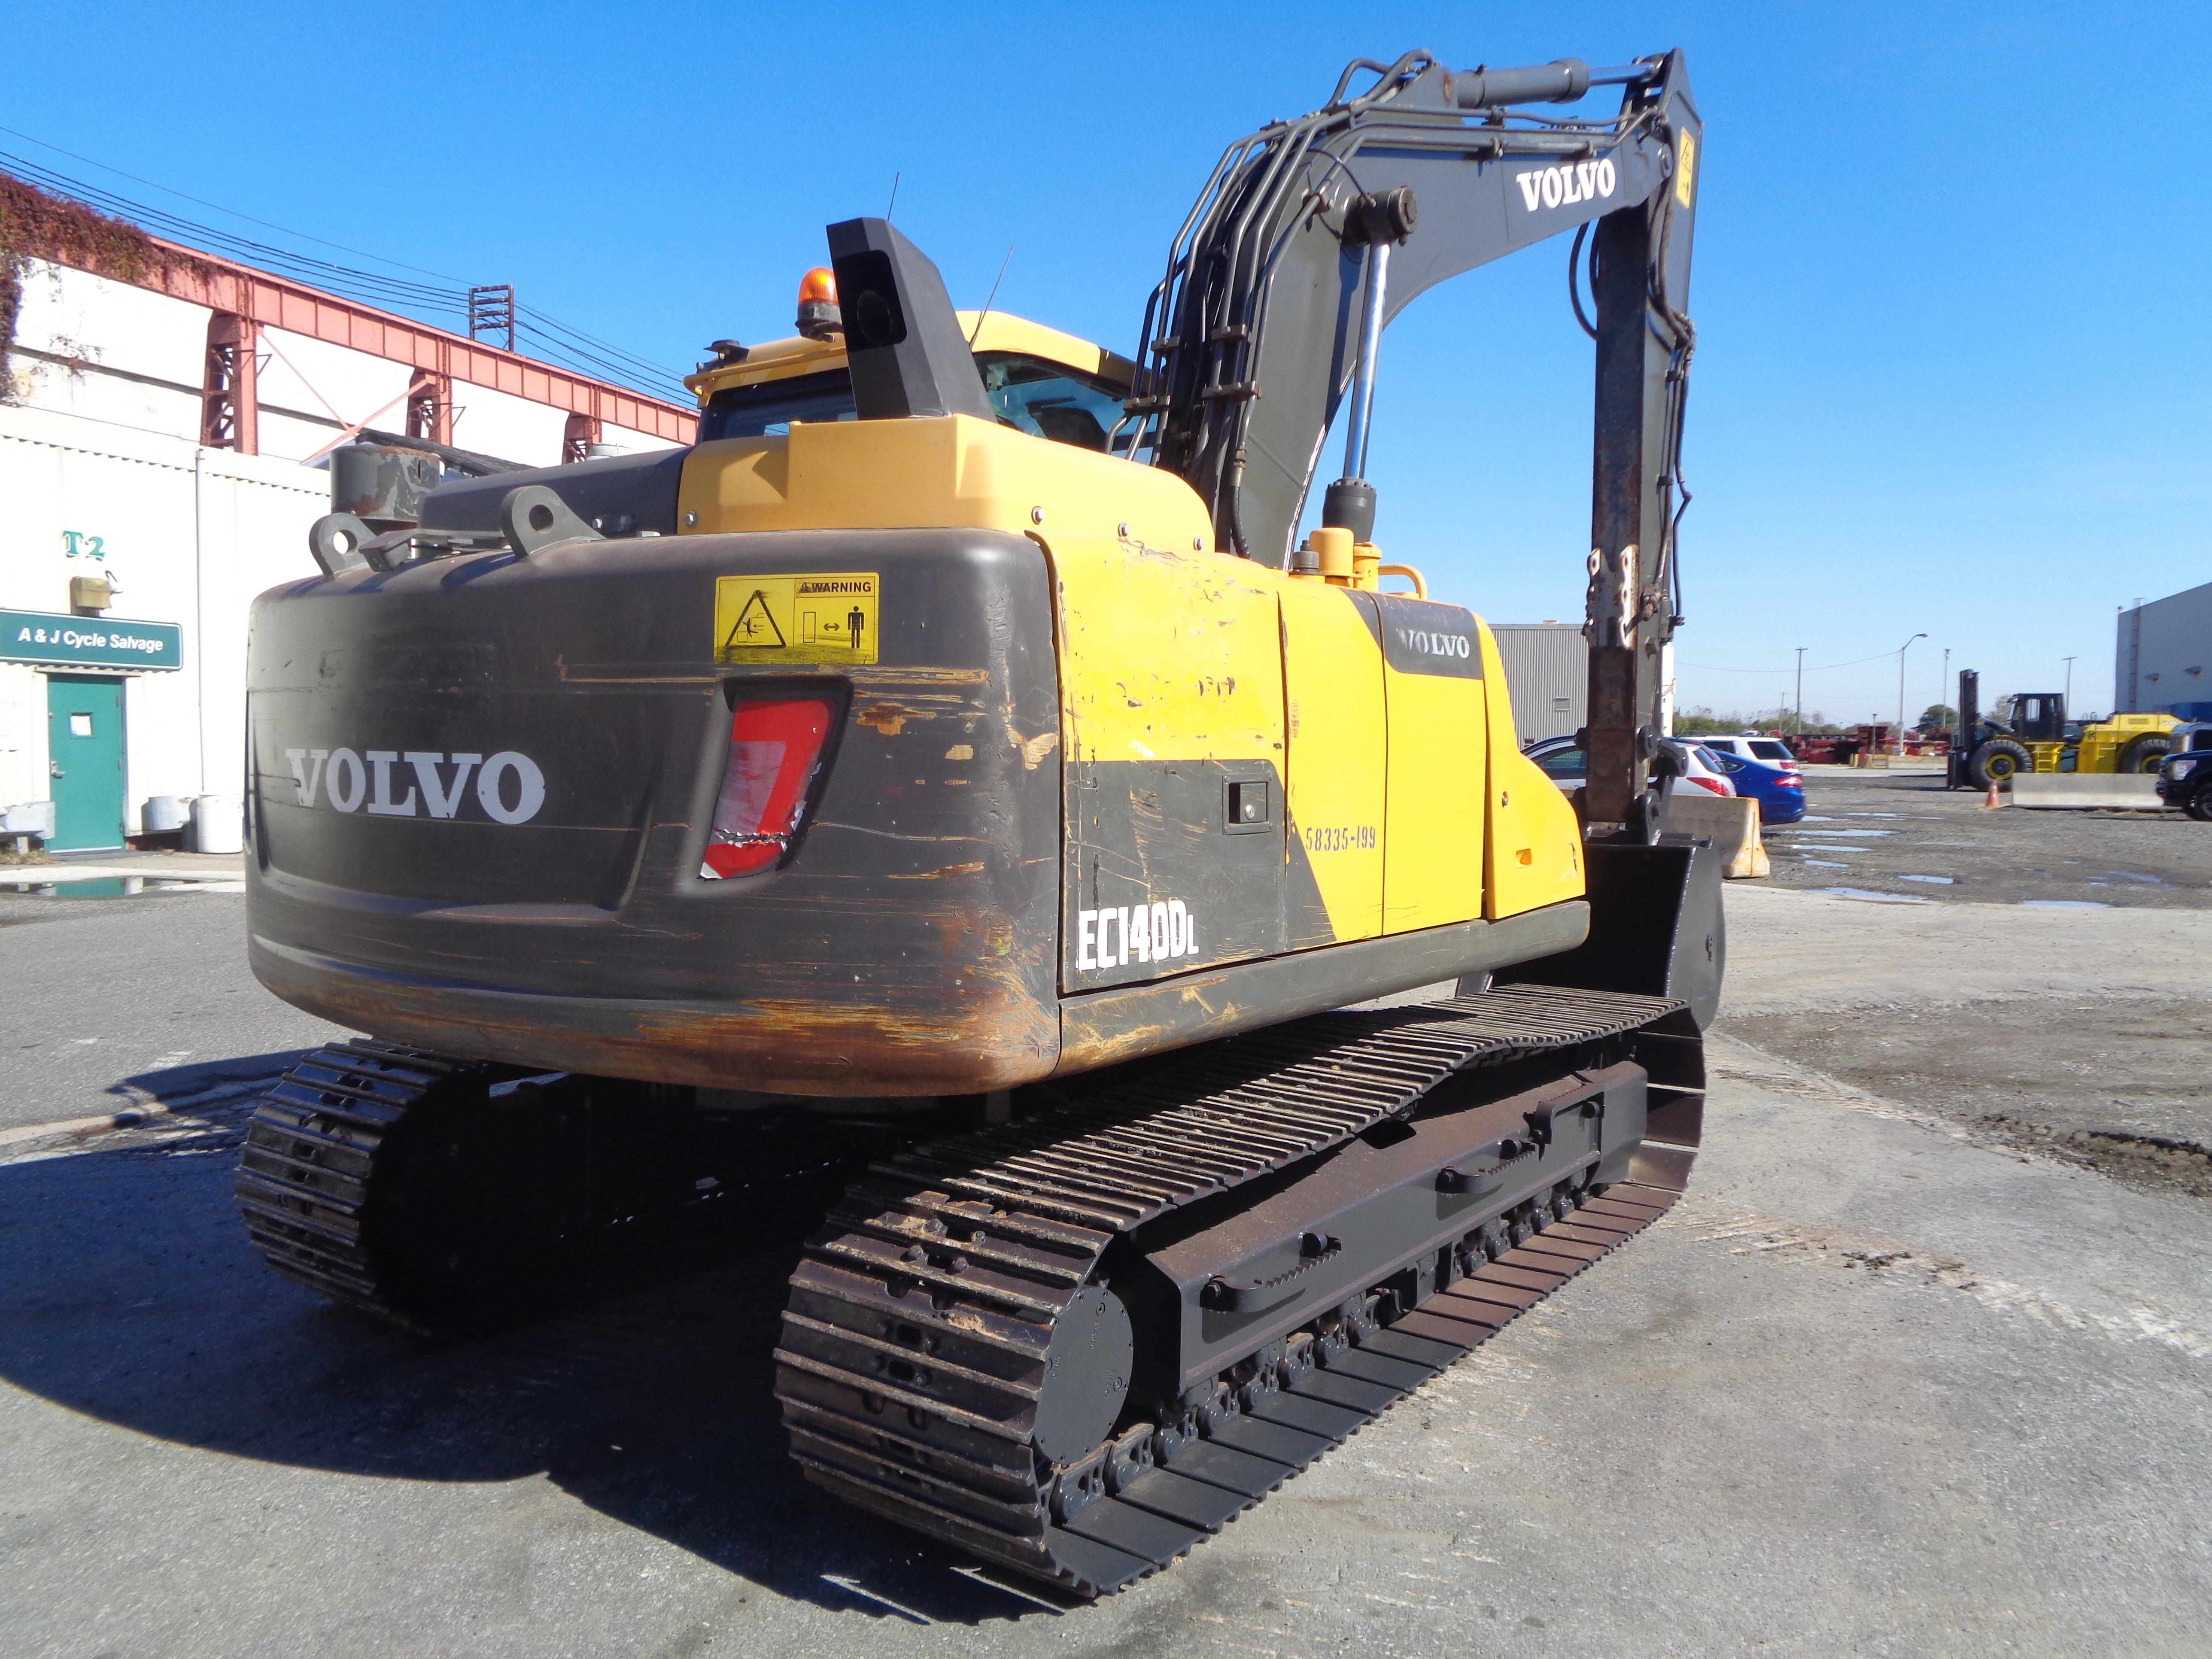 Lot 11 - 2013 Volvo EC140DL Excavator